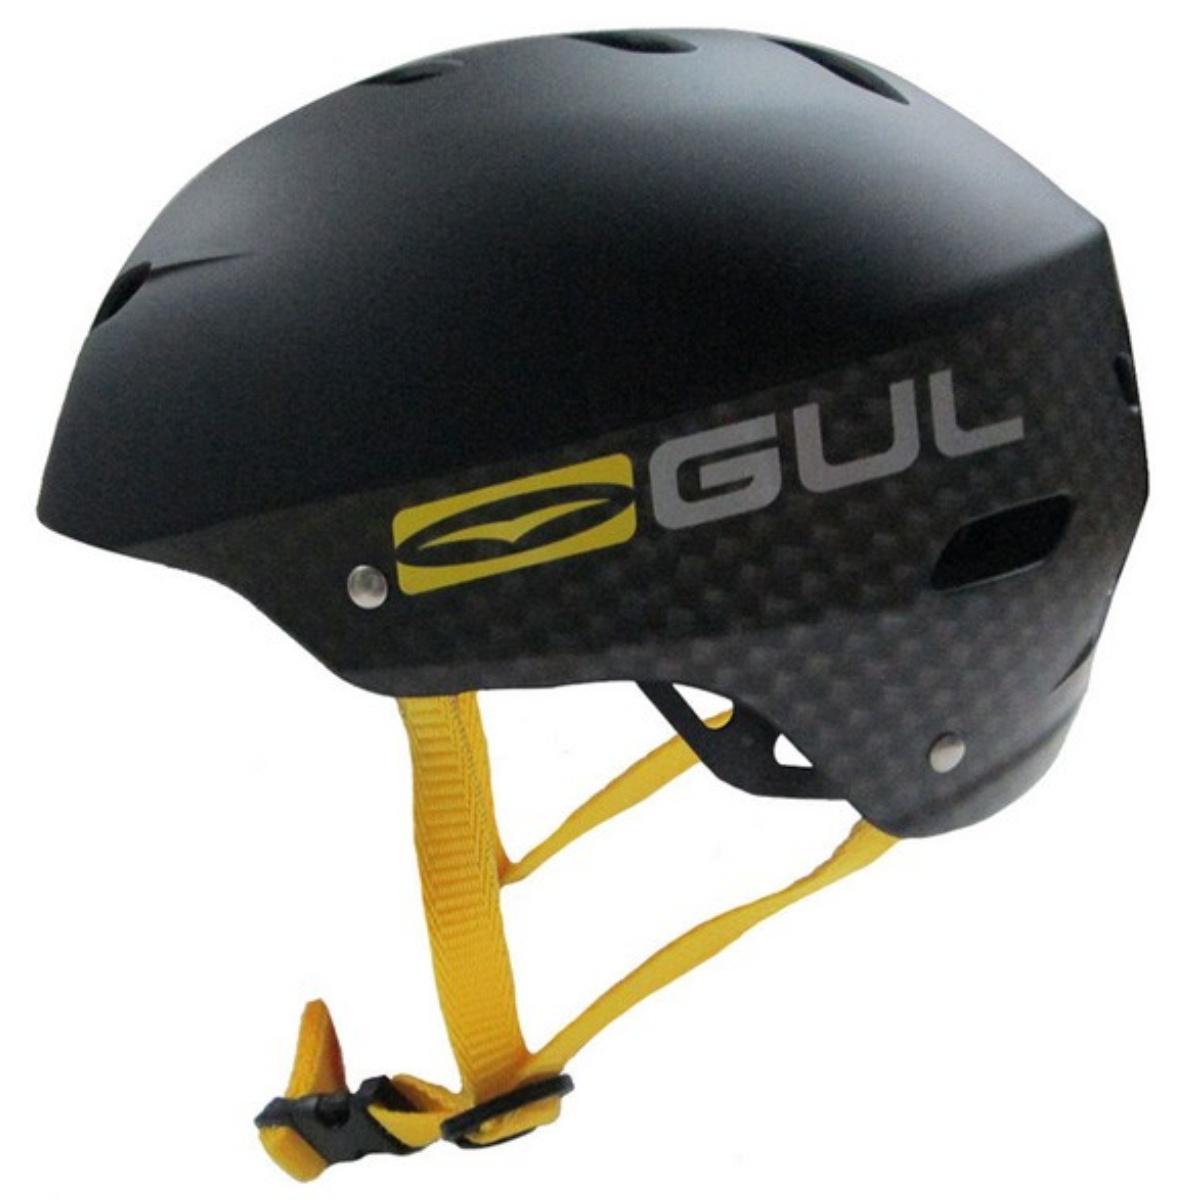 Prilba GUL Evo 2 Helmet